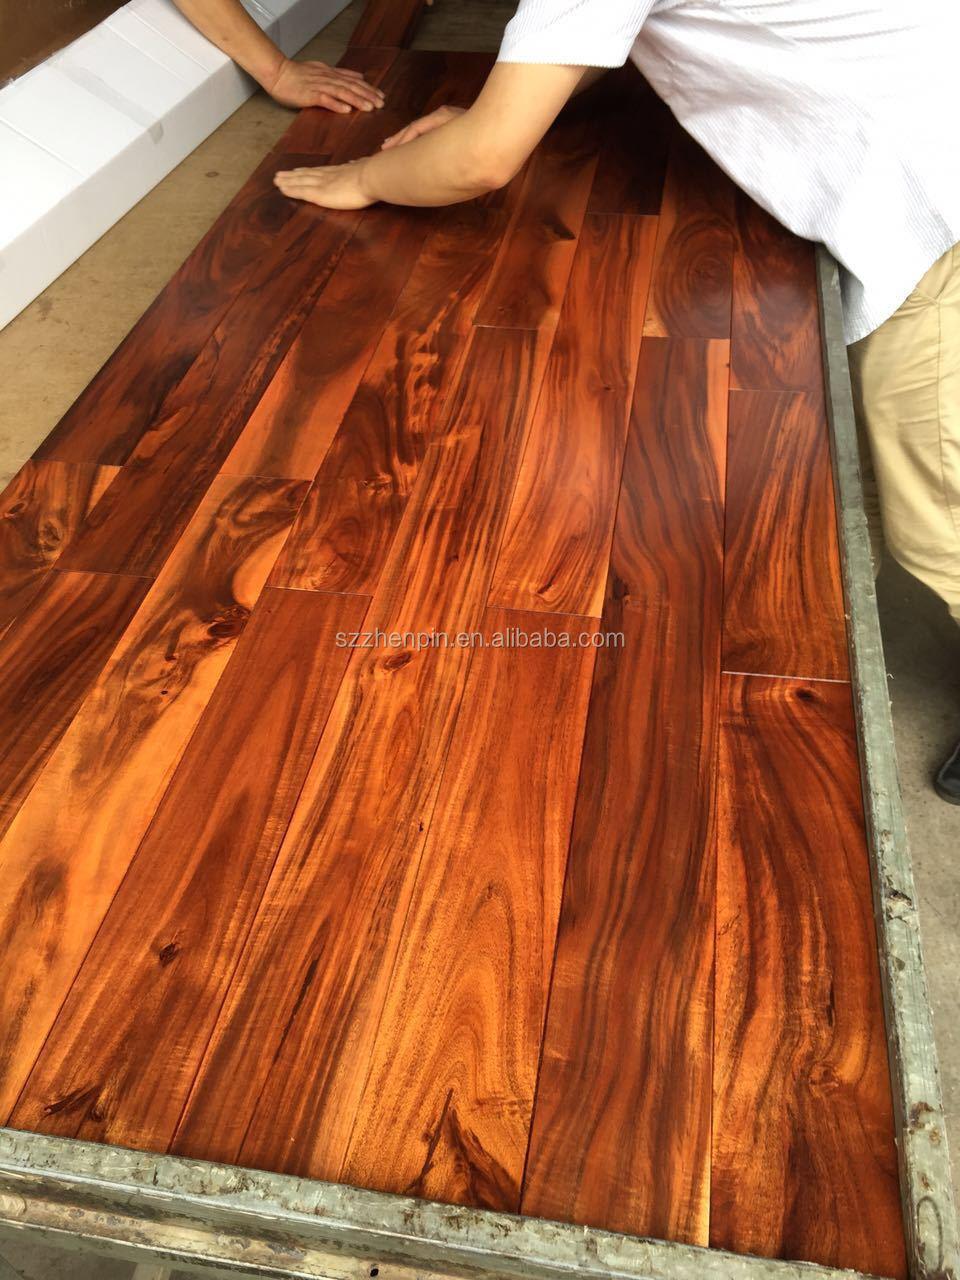 anti acacia ejjnnylpvqhe hardwood floors wood product flooring solid china scratch